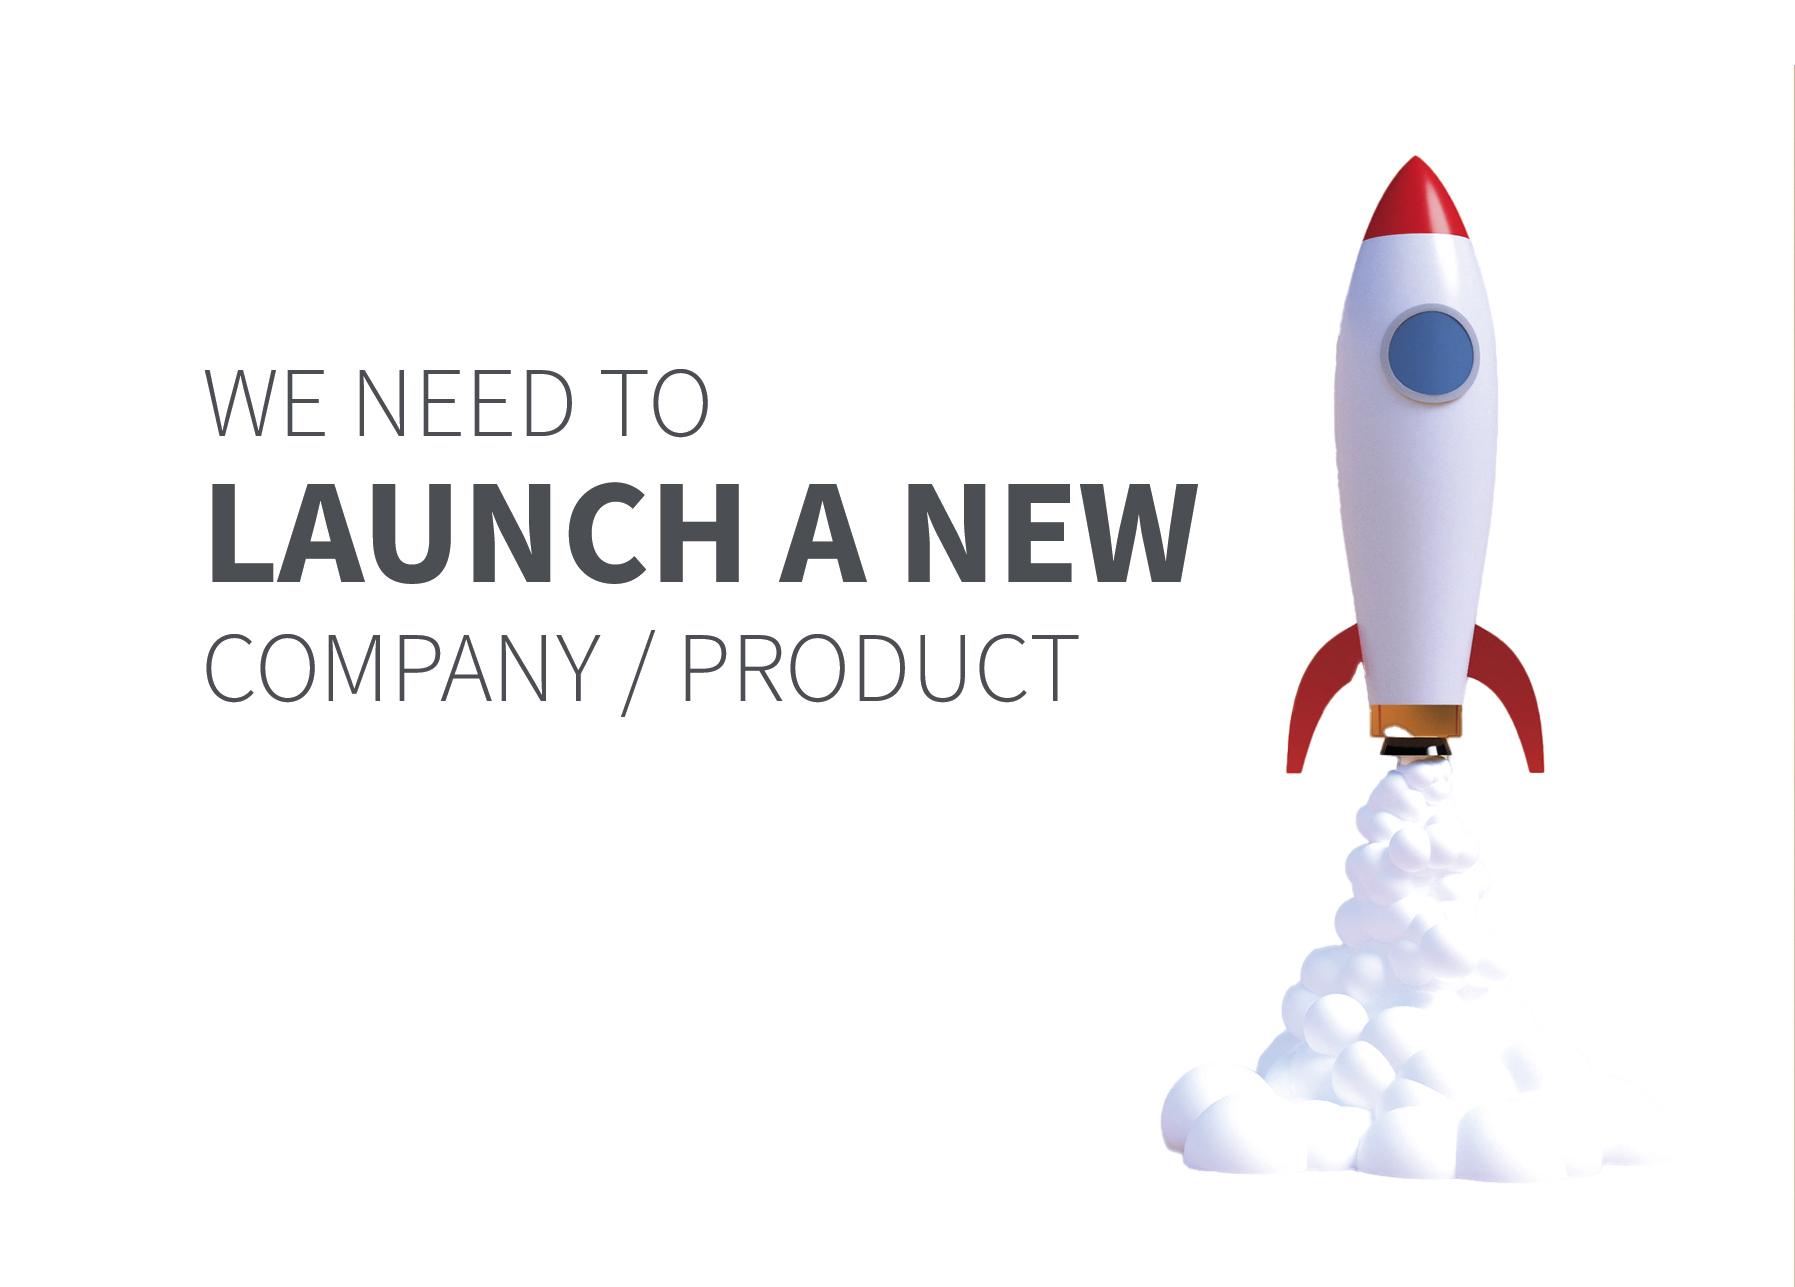 Outcome 2 - New Launch